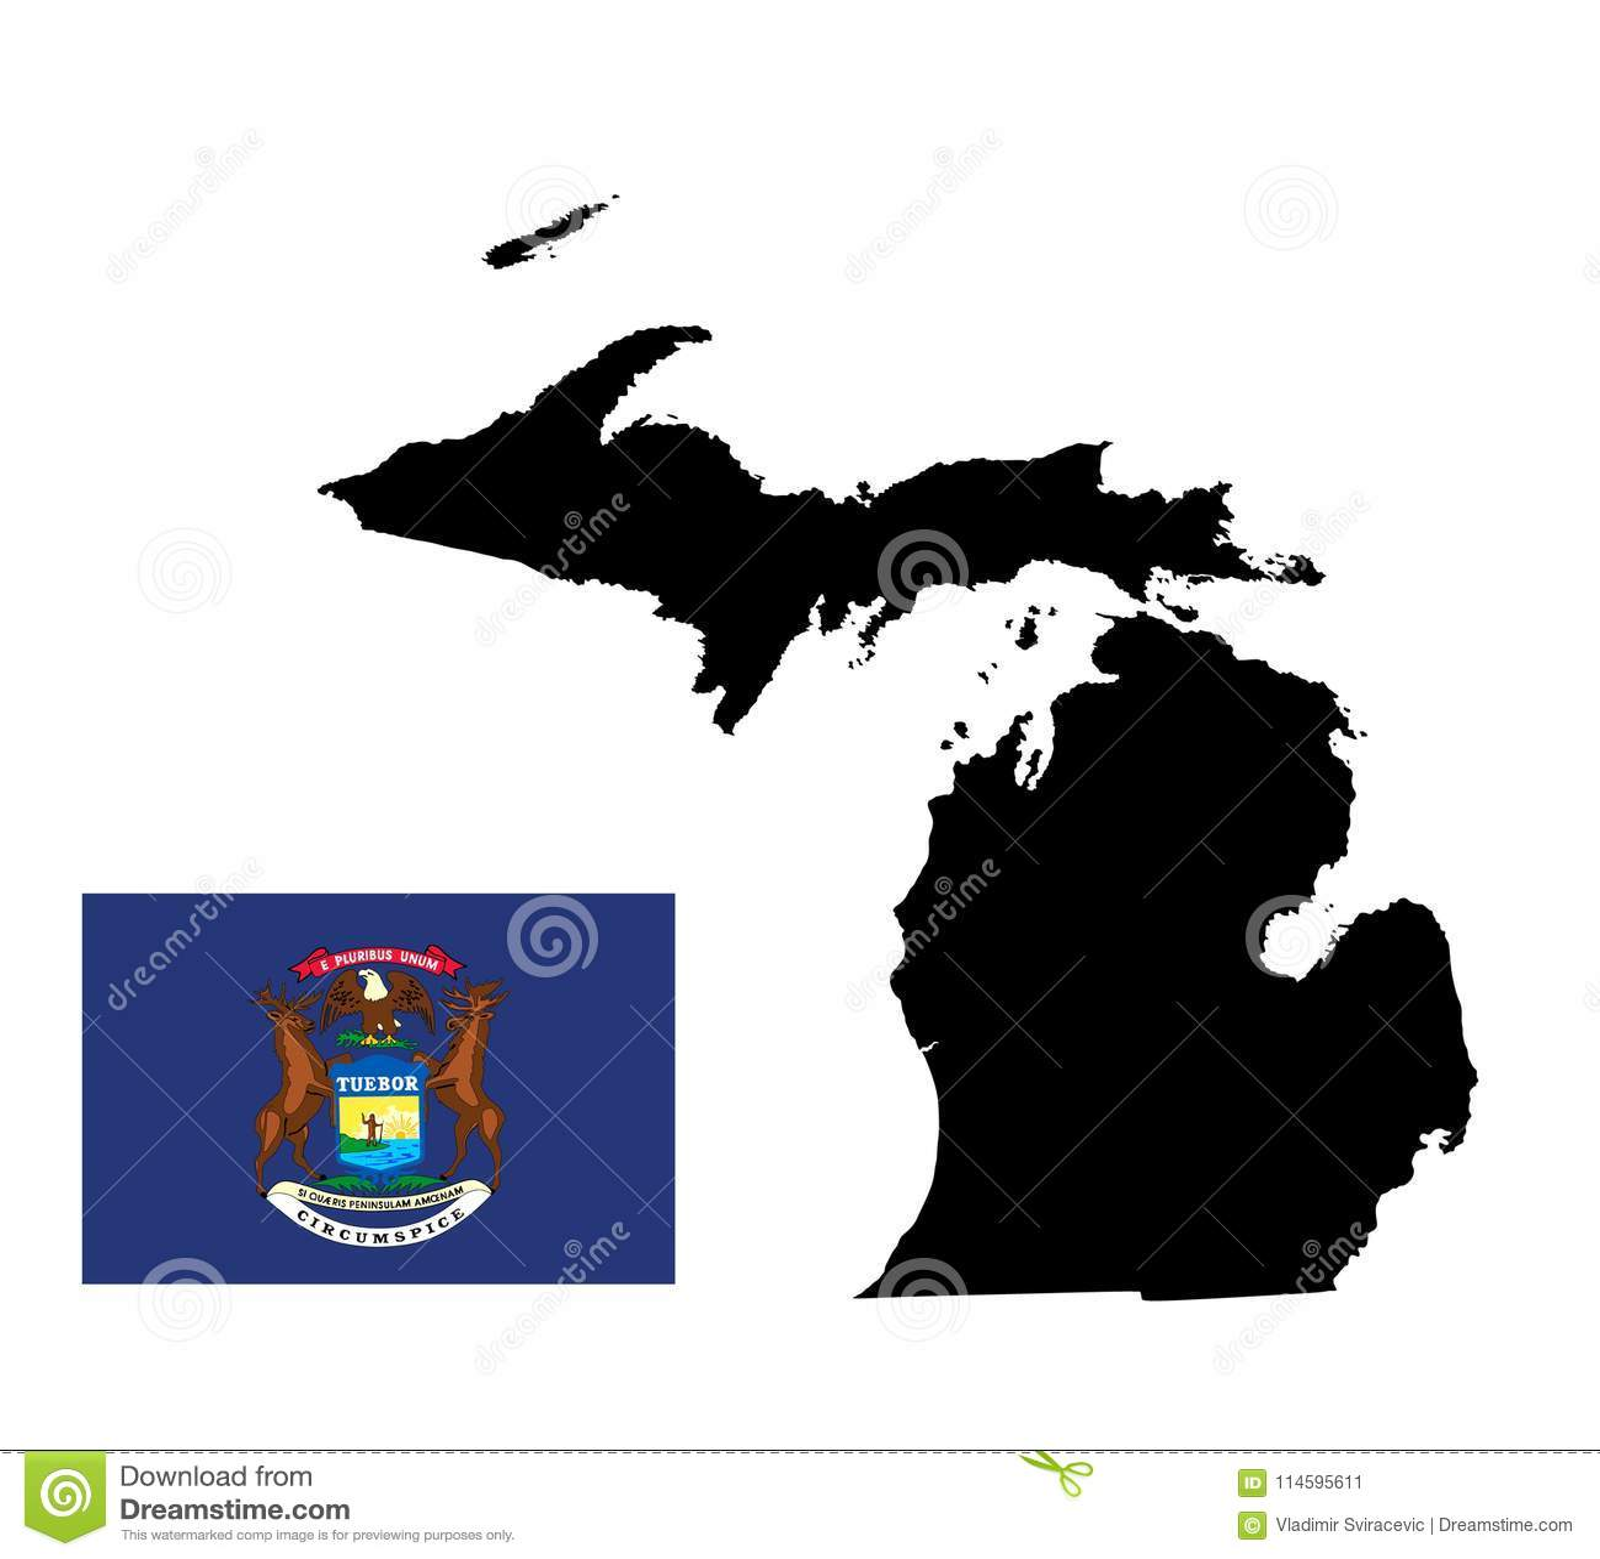 Silueta Del Mapa De Michigan Bandera Del Estado De Michigan Stock de ...